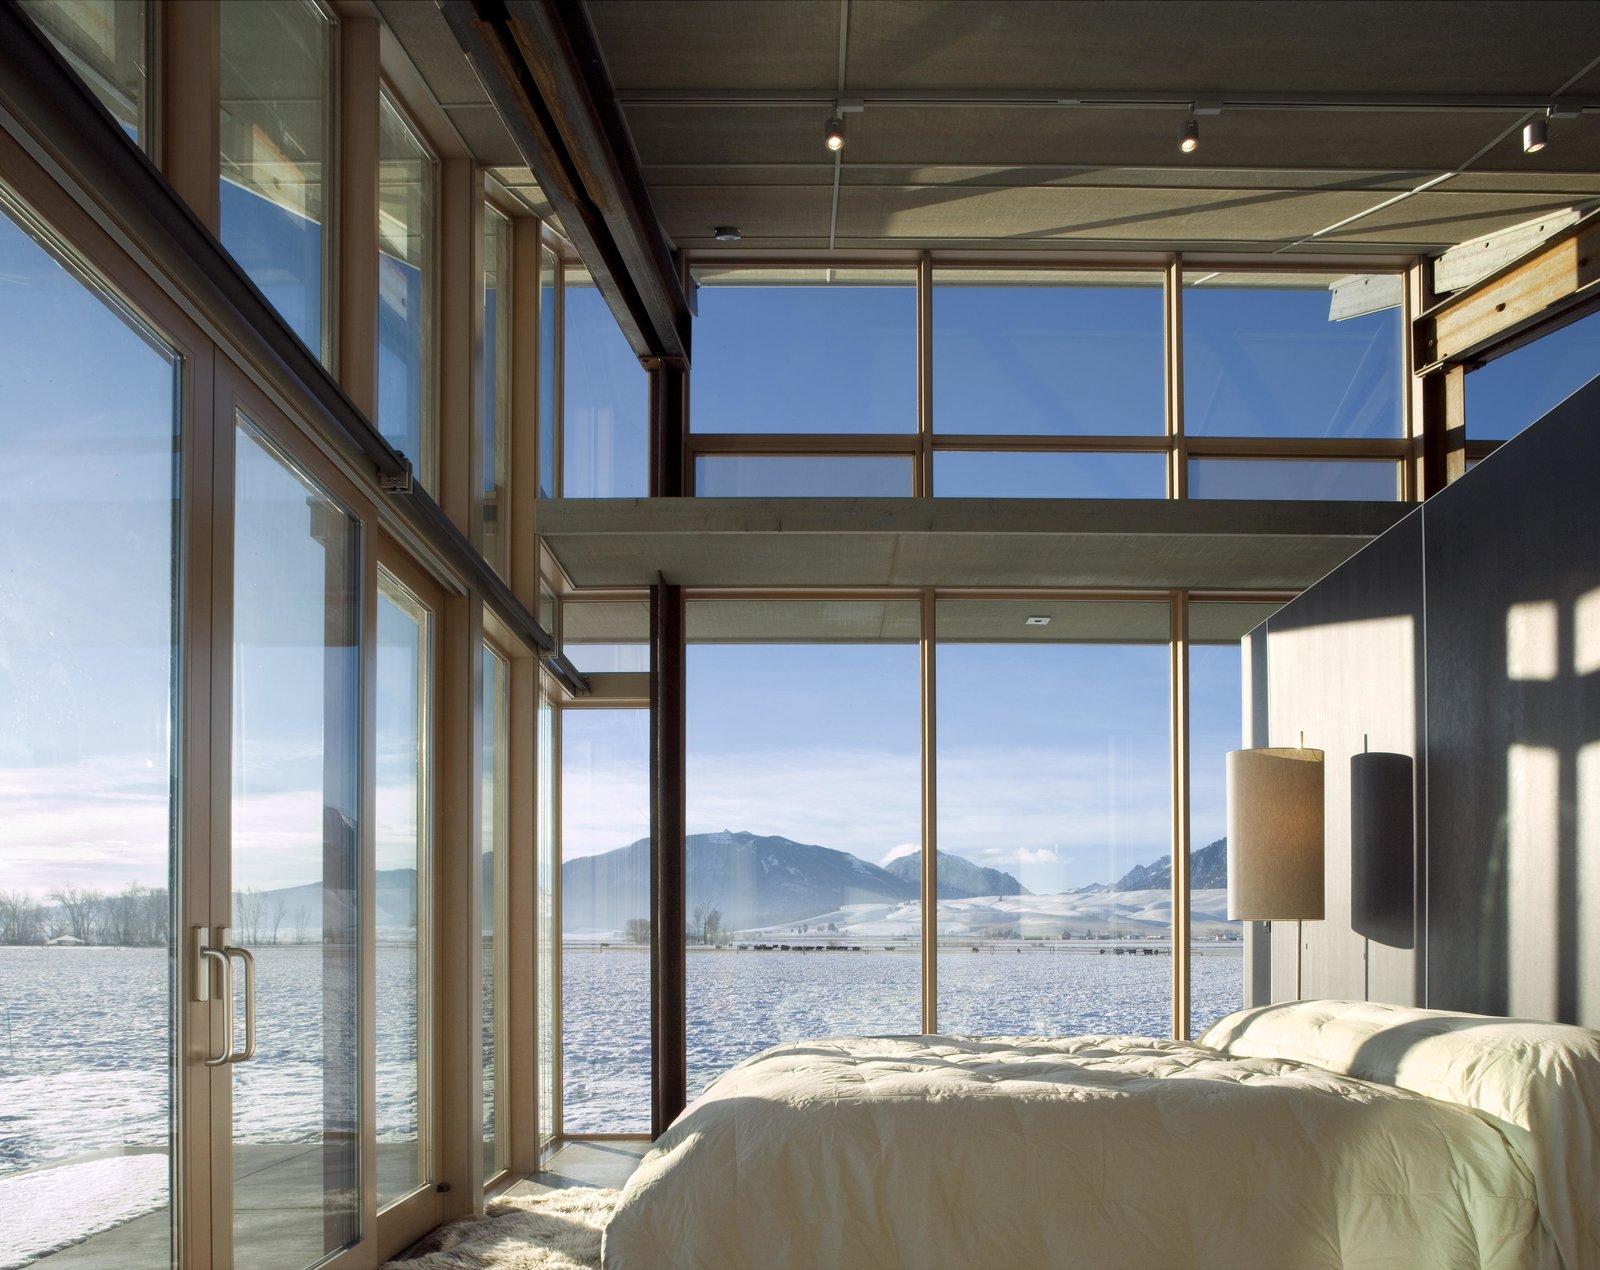 Glass Farmhouse | Olson Kundig Tagged: Bedroom, Bed, and Floor Lighting.  Glass Farmhouse by Olson Kundig